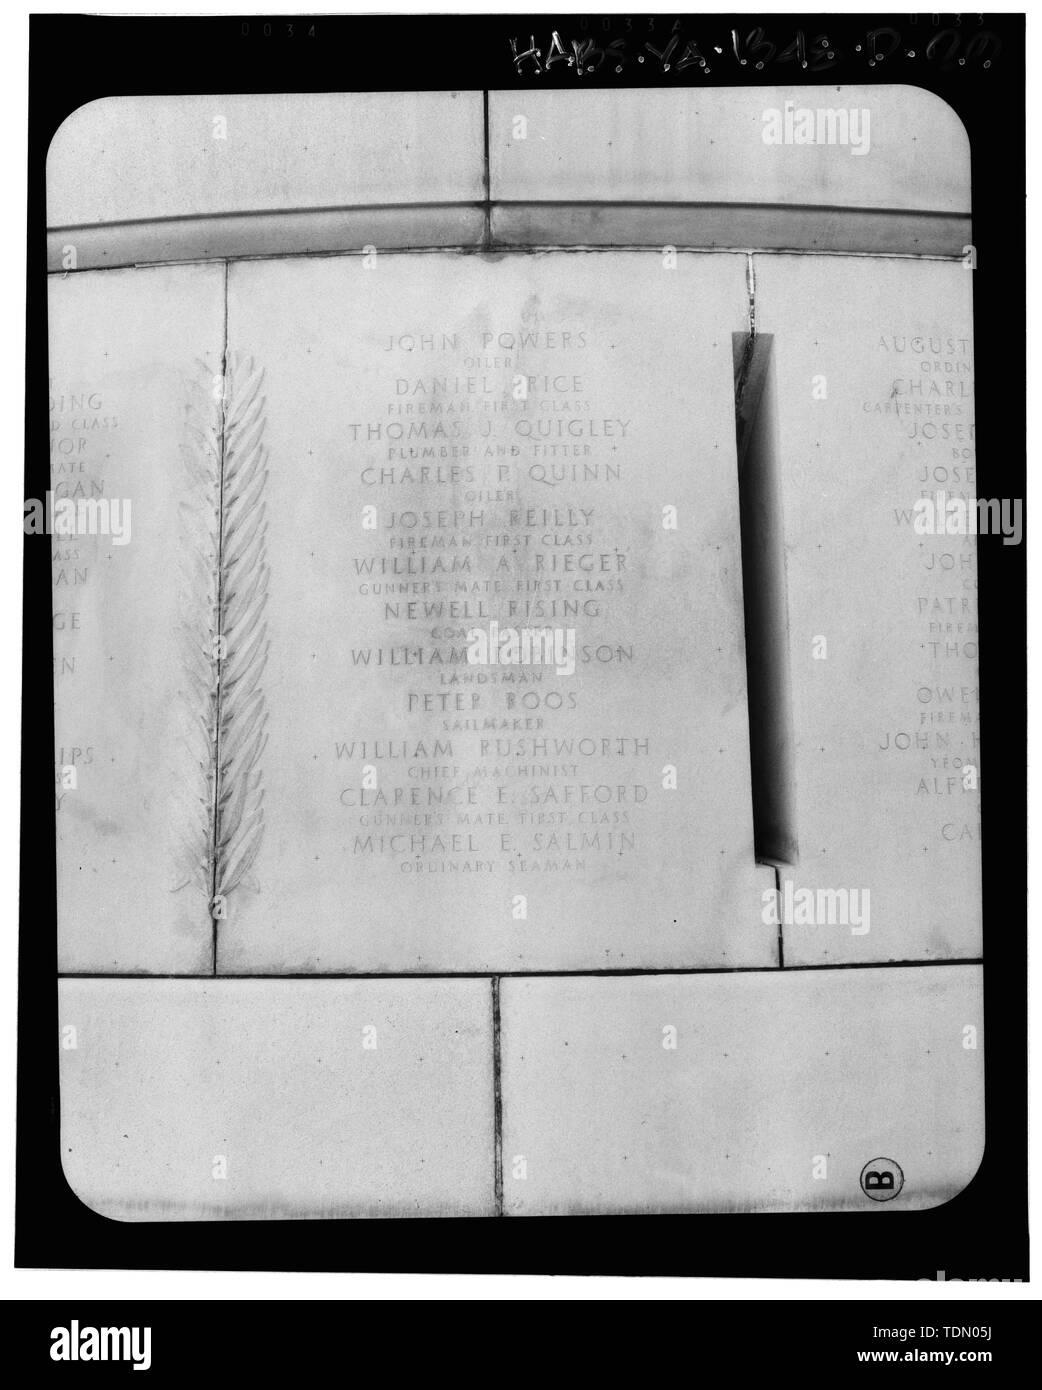 Panel 19 - Arlington National Cemetery, USS Maine Memorial, Arlington, Arlington County, VA; U.S. Army Corps of Engineers; Wyeth, Nathan C; Black, William M; Patrick, Mason M; Ferguson, H B; Bixby, W H; Goodson, W F; Lackawanna Steel Company; T.L. Huston Construction Company; Harris Brothers; Clark, D Lombillo; Primelles, Arturo; Rhodes, D H; Jenkins, Oliver B; Tilford, James D; Aleshire, J B; Stimson, H E; Scofield, John J; Hugh, R P; Houston, J B; Sharpe, Henry G; Downey, G F; Clem, L; Cosby, Spencer; Taft, William Howard; Commission of Fine Arts; Olmsted, Fredrick Law; French, Daniel Cheste - Stock Image